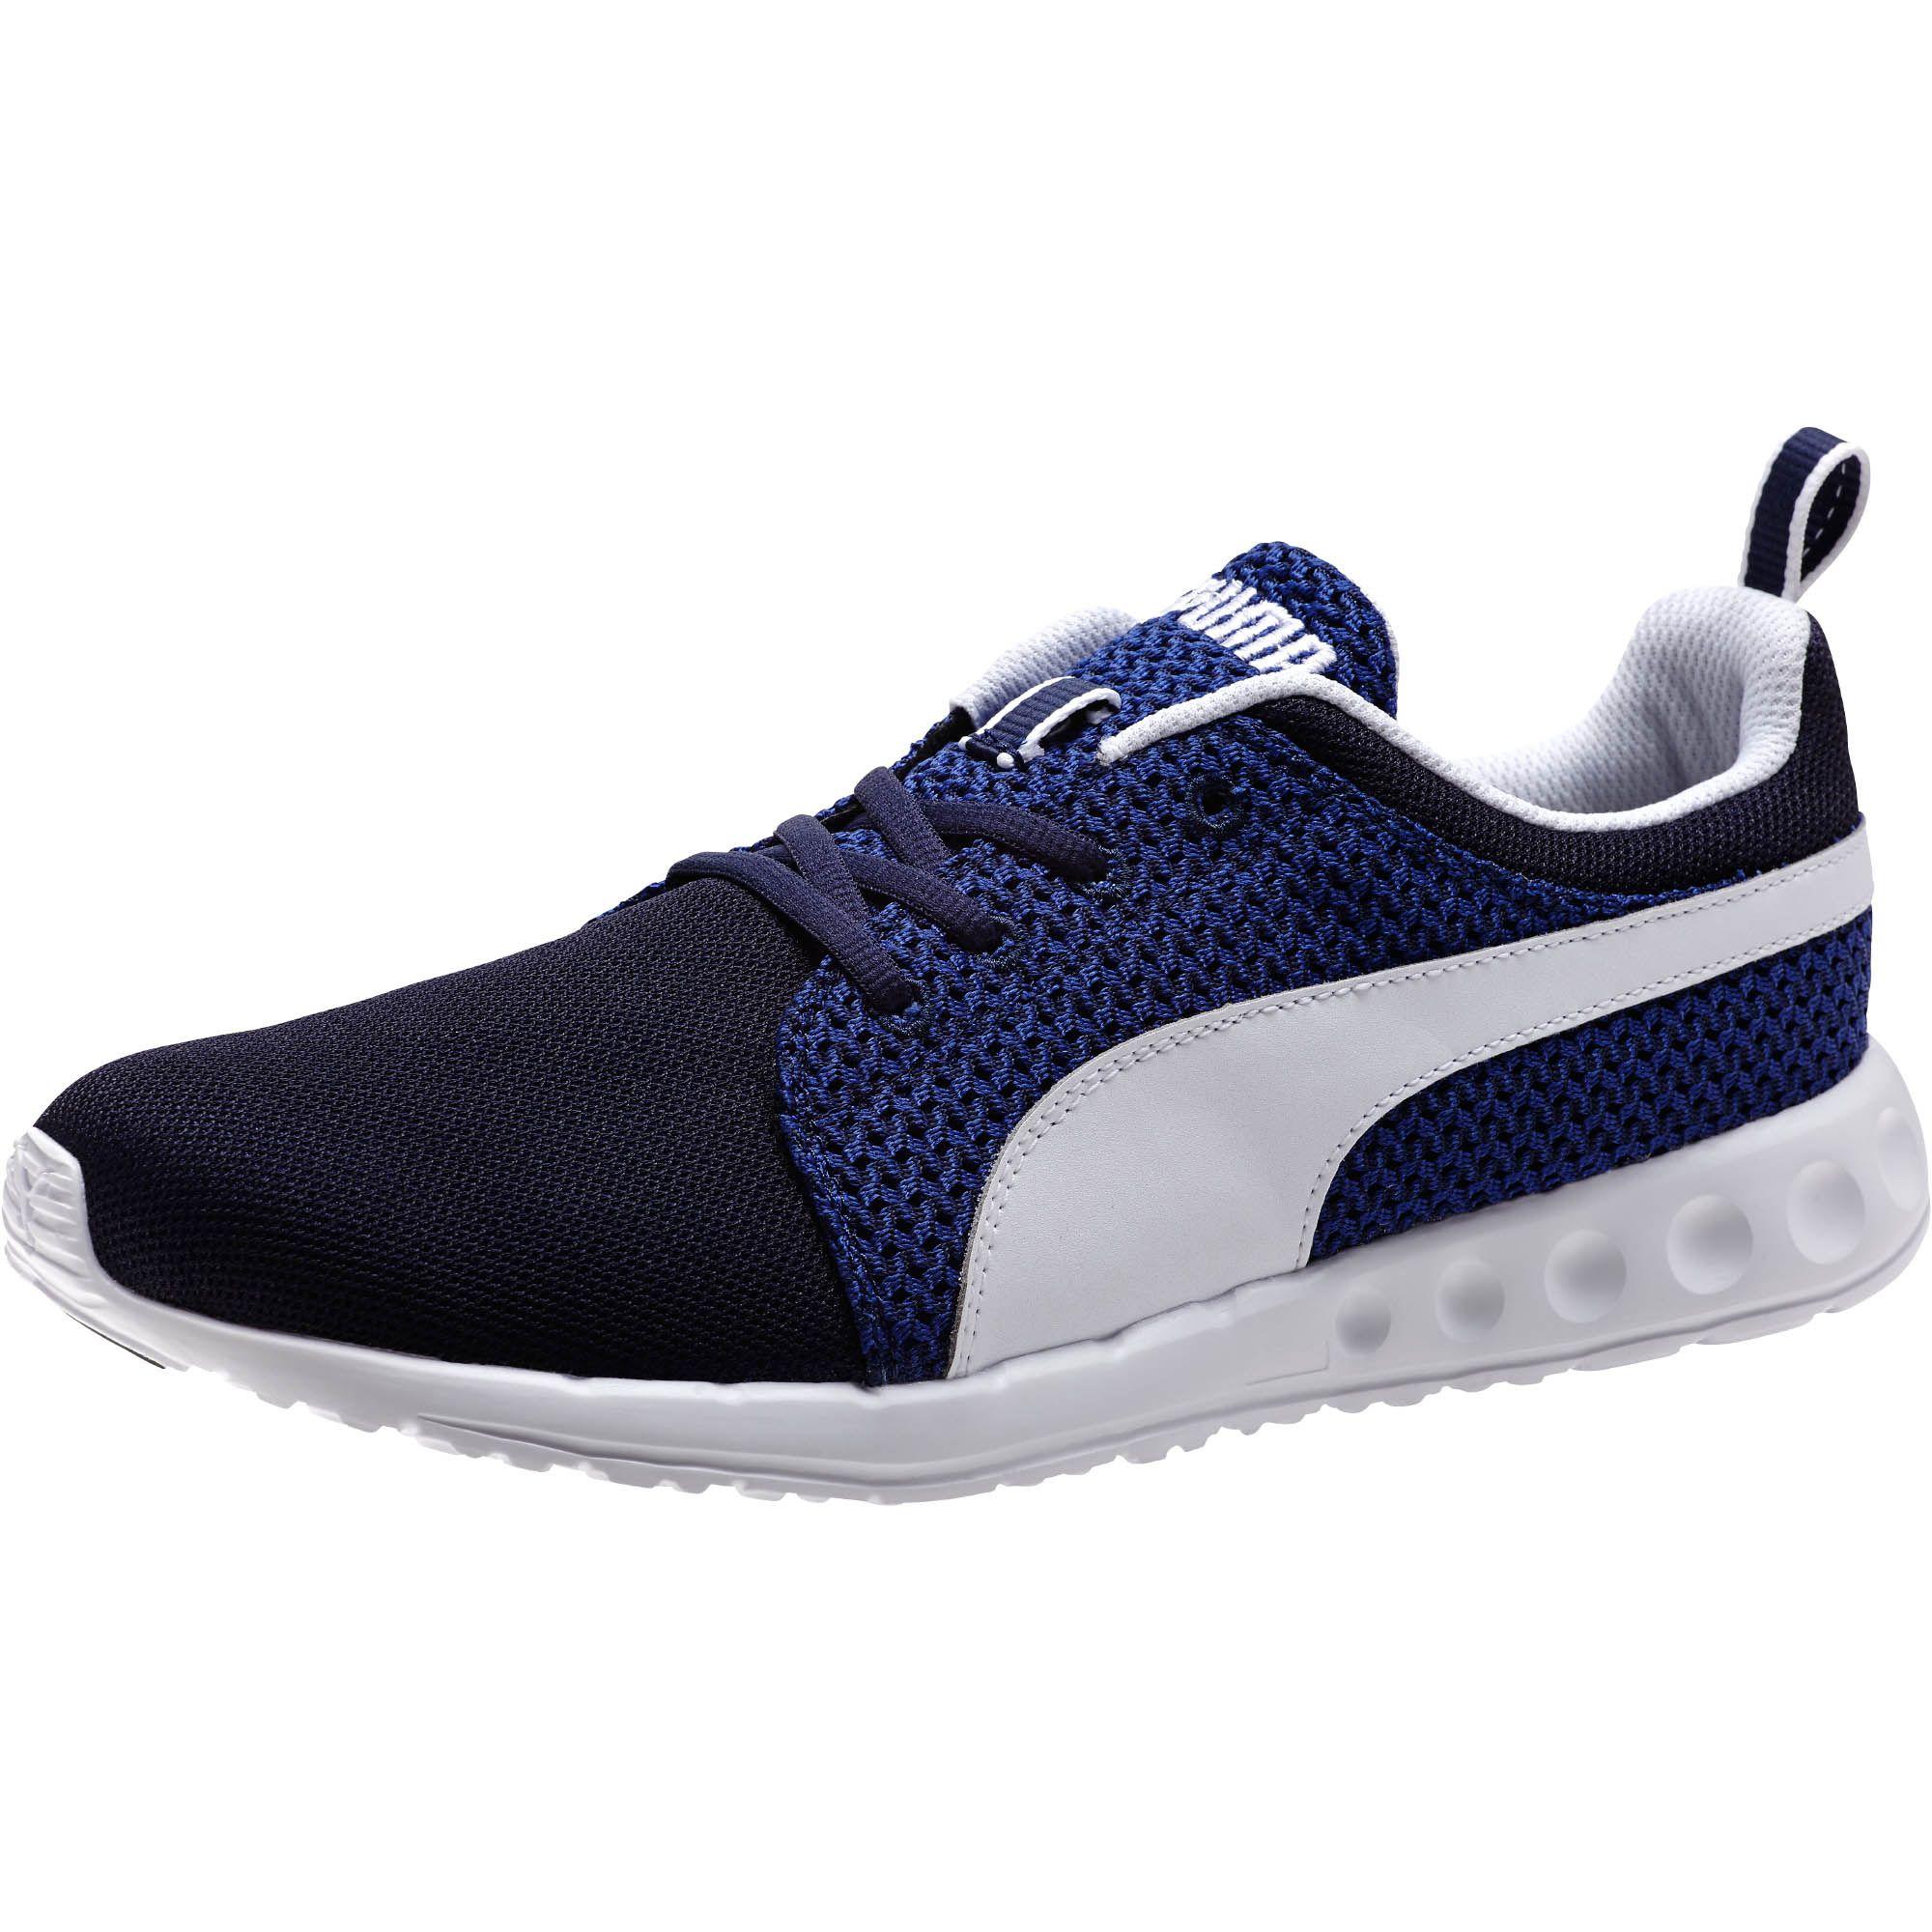 Puma Carson Runner Knit Chaussures De Course Chaussures Running Courir Hommes Neuf